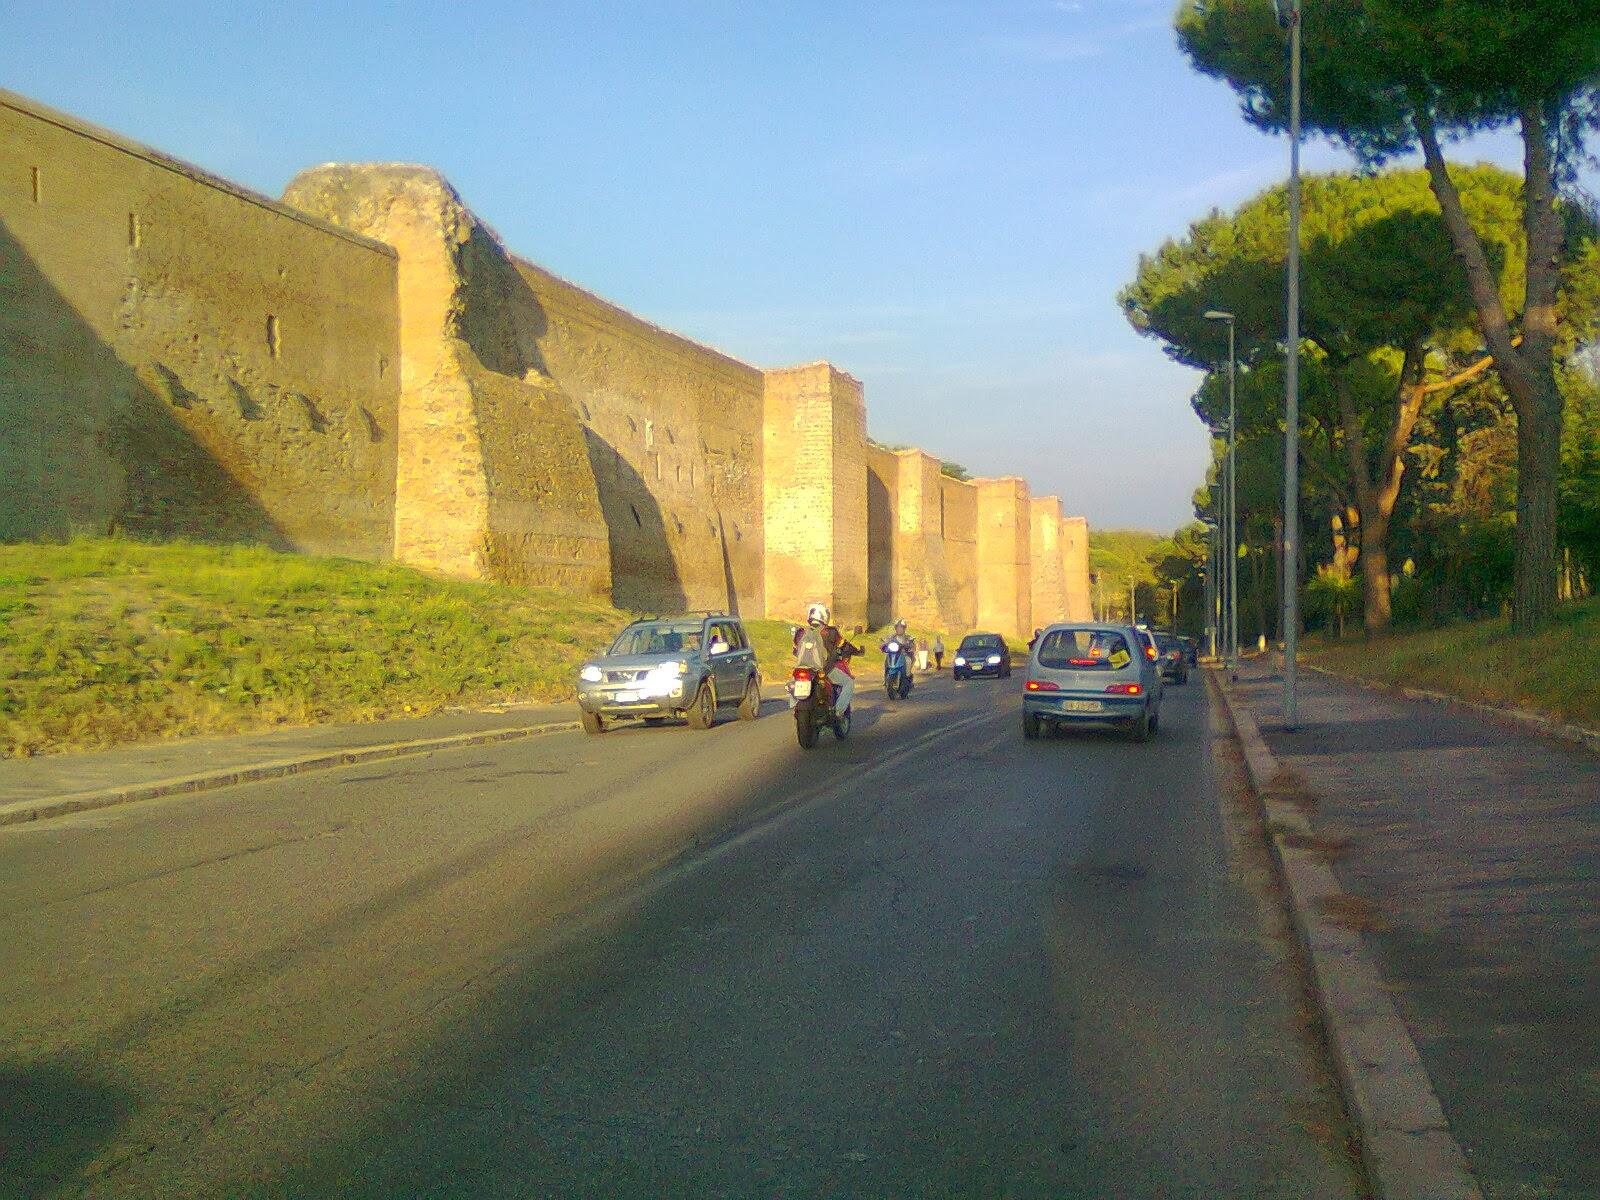 In bici per roma la rivoluzione verde di milano pu - Via di porta ardeatina ...